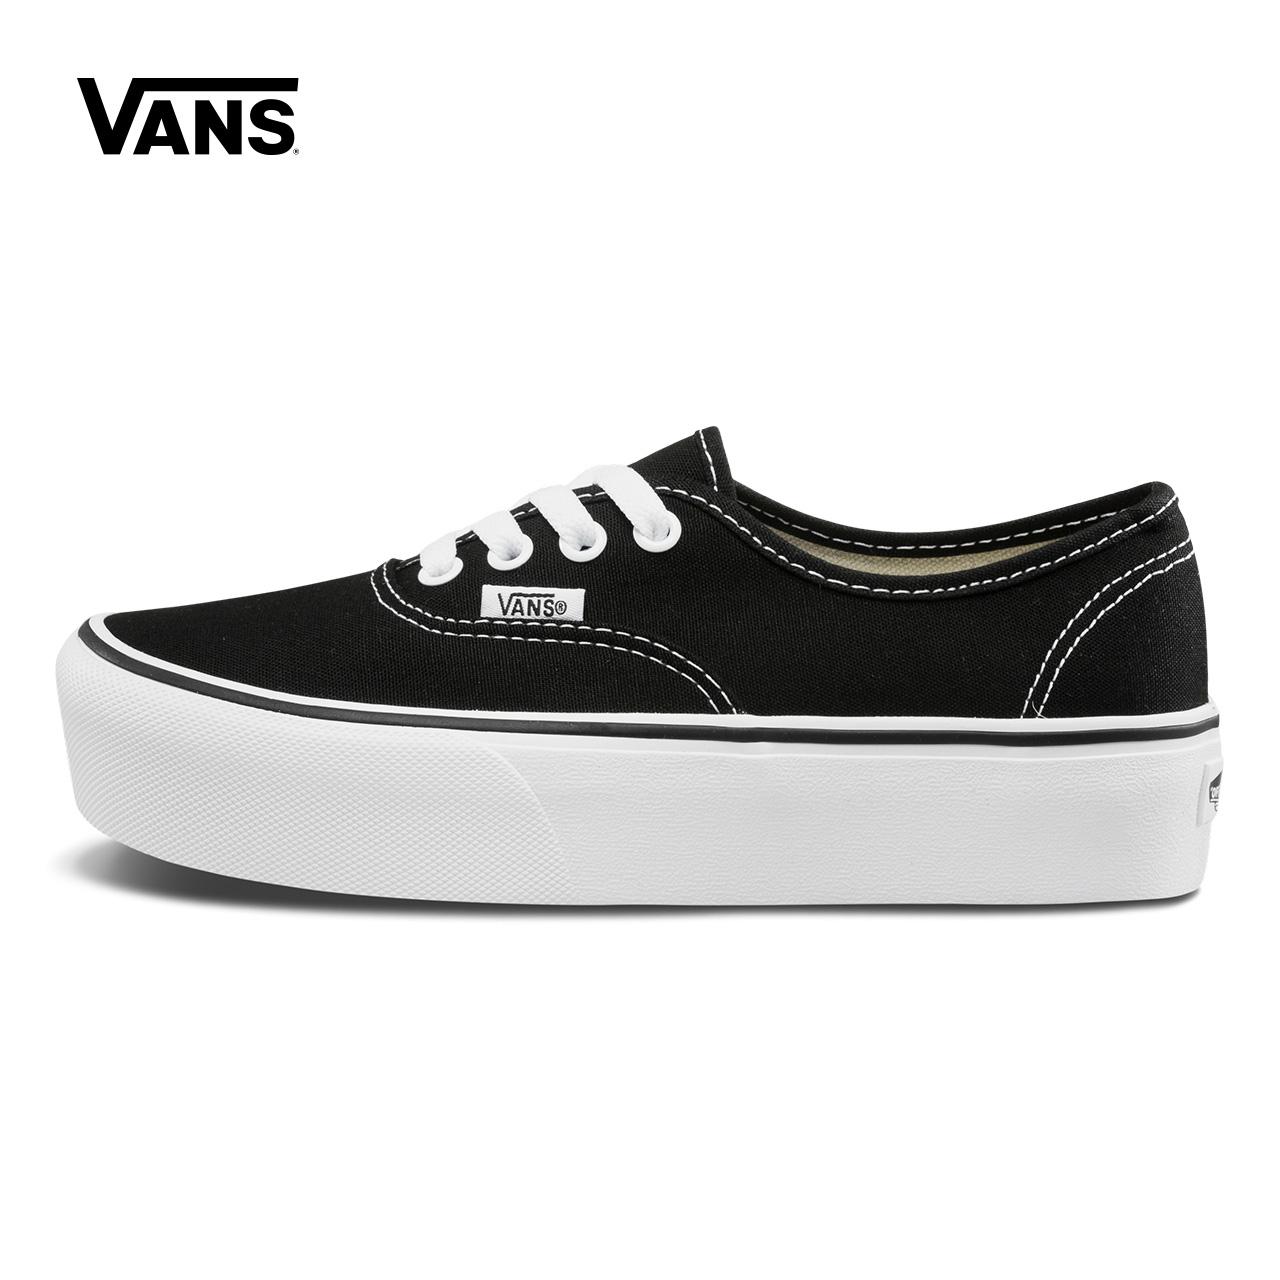 Vans 范斯官方女款AUTHENTIC板鞋 VN0A3AV8BLK